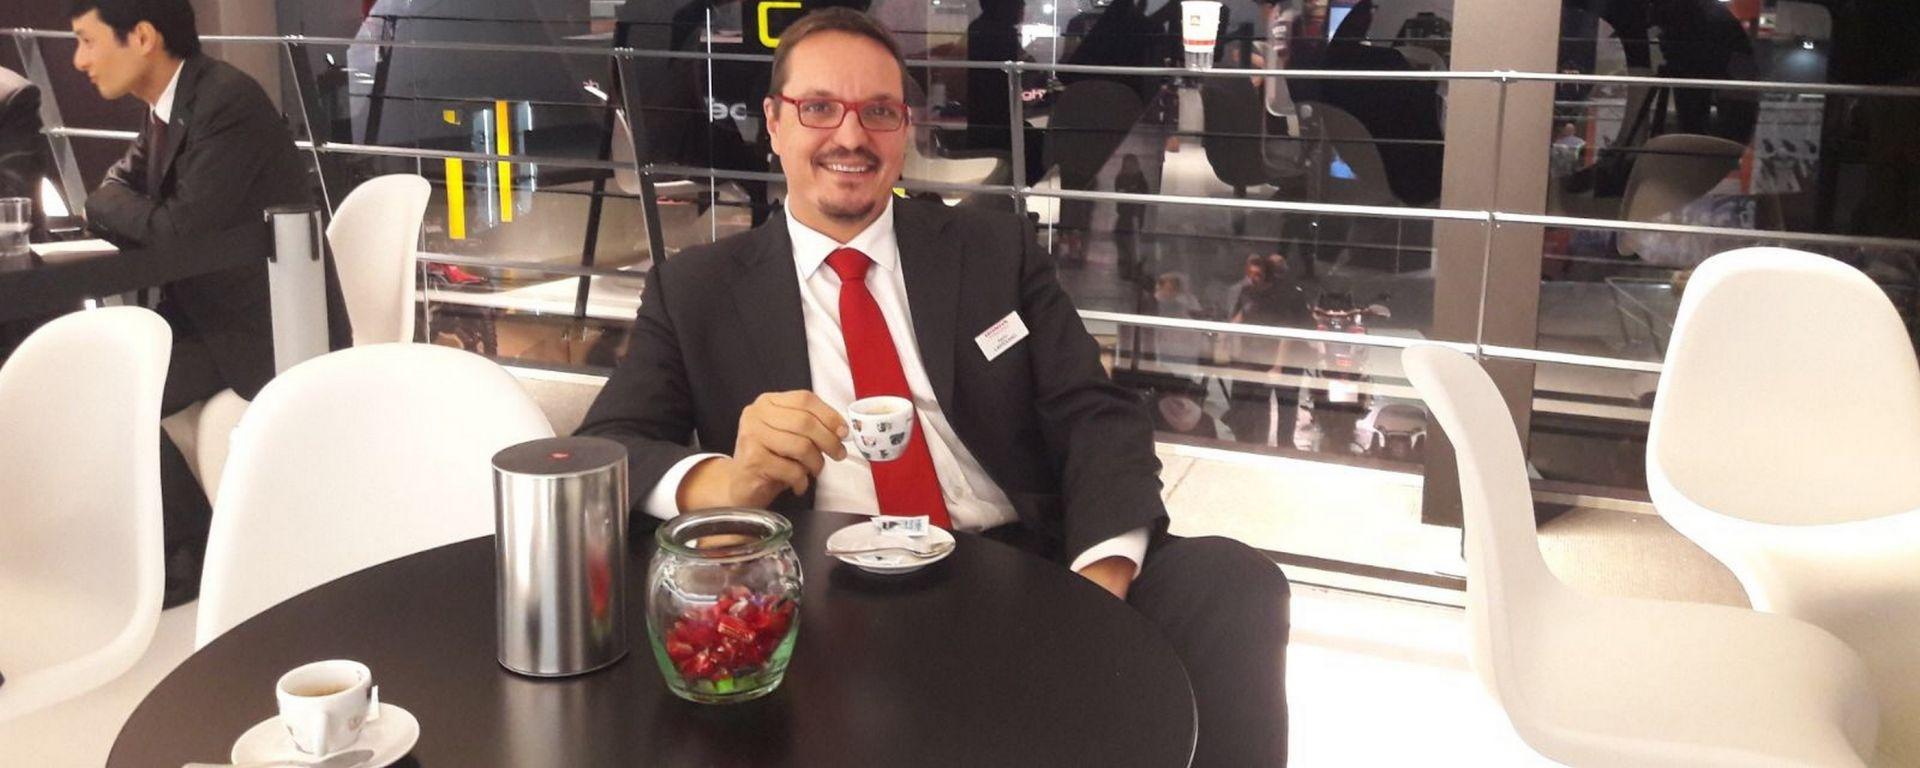 Paolo Cartolano, Communication Manager Honda Motor Europe Ltd. Italia